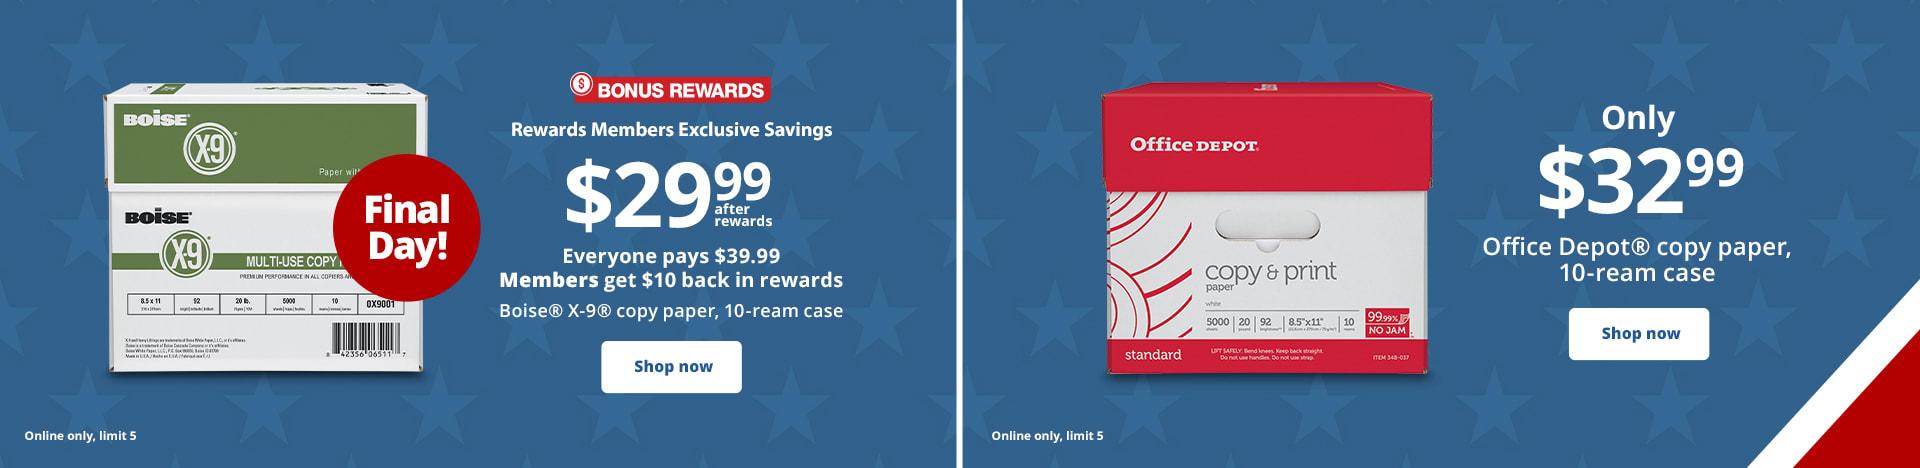 BONUS REWARDS only $29.99 after rewards Boise® X-9®copy paper, 10-ream case | $32.99 Office Depot® copy paper, 10-ream case